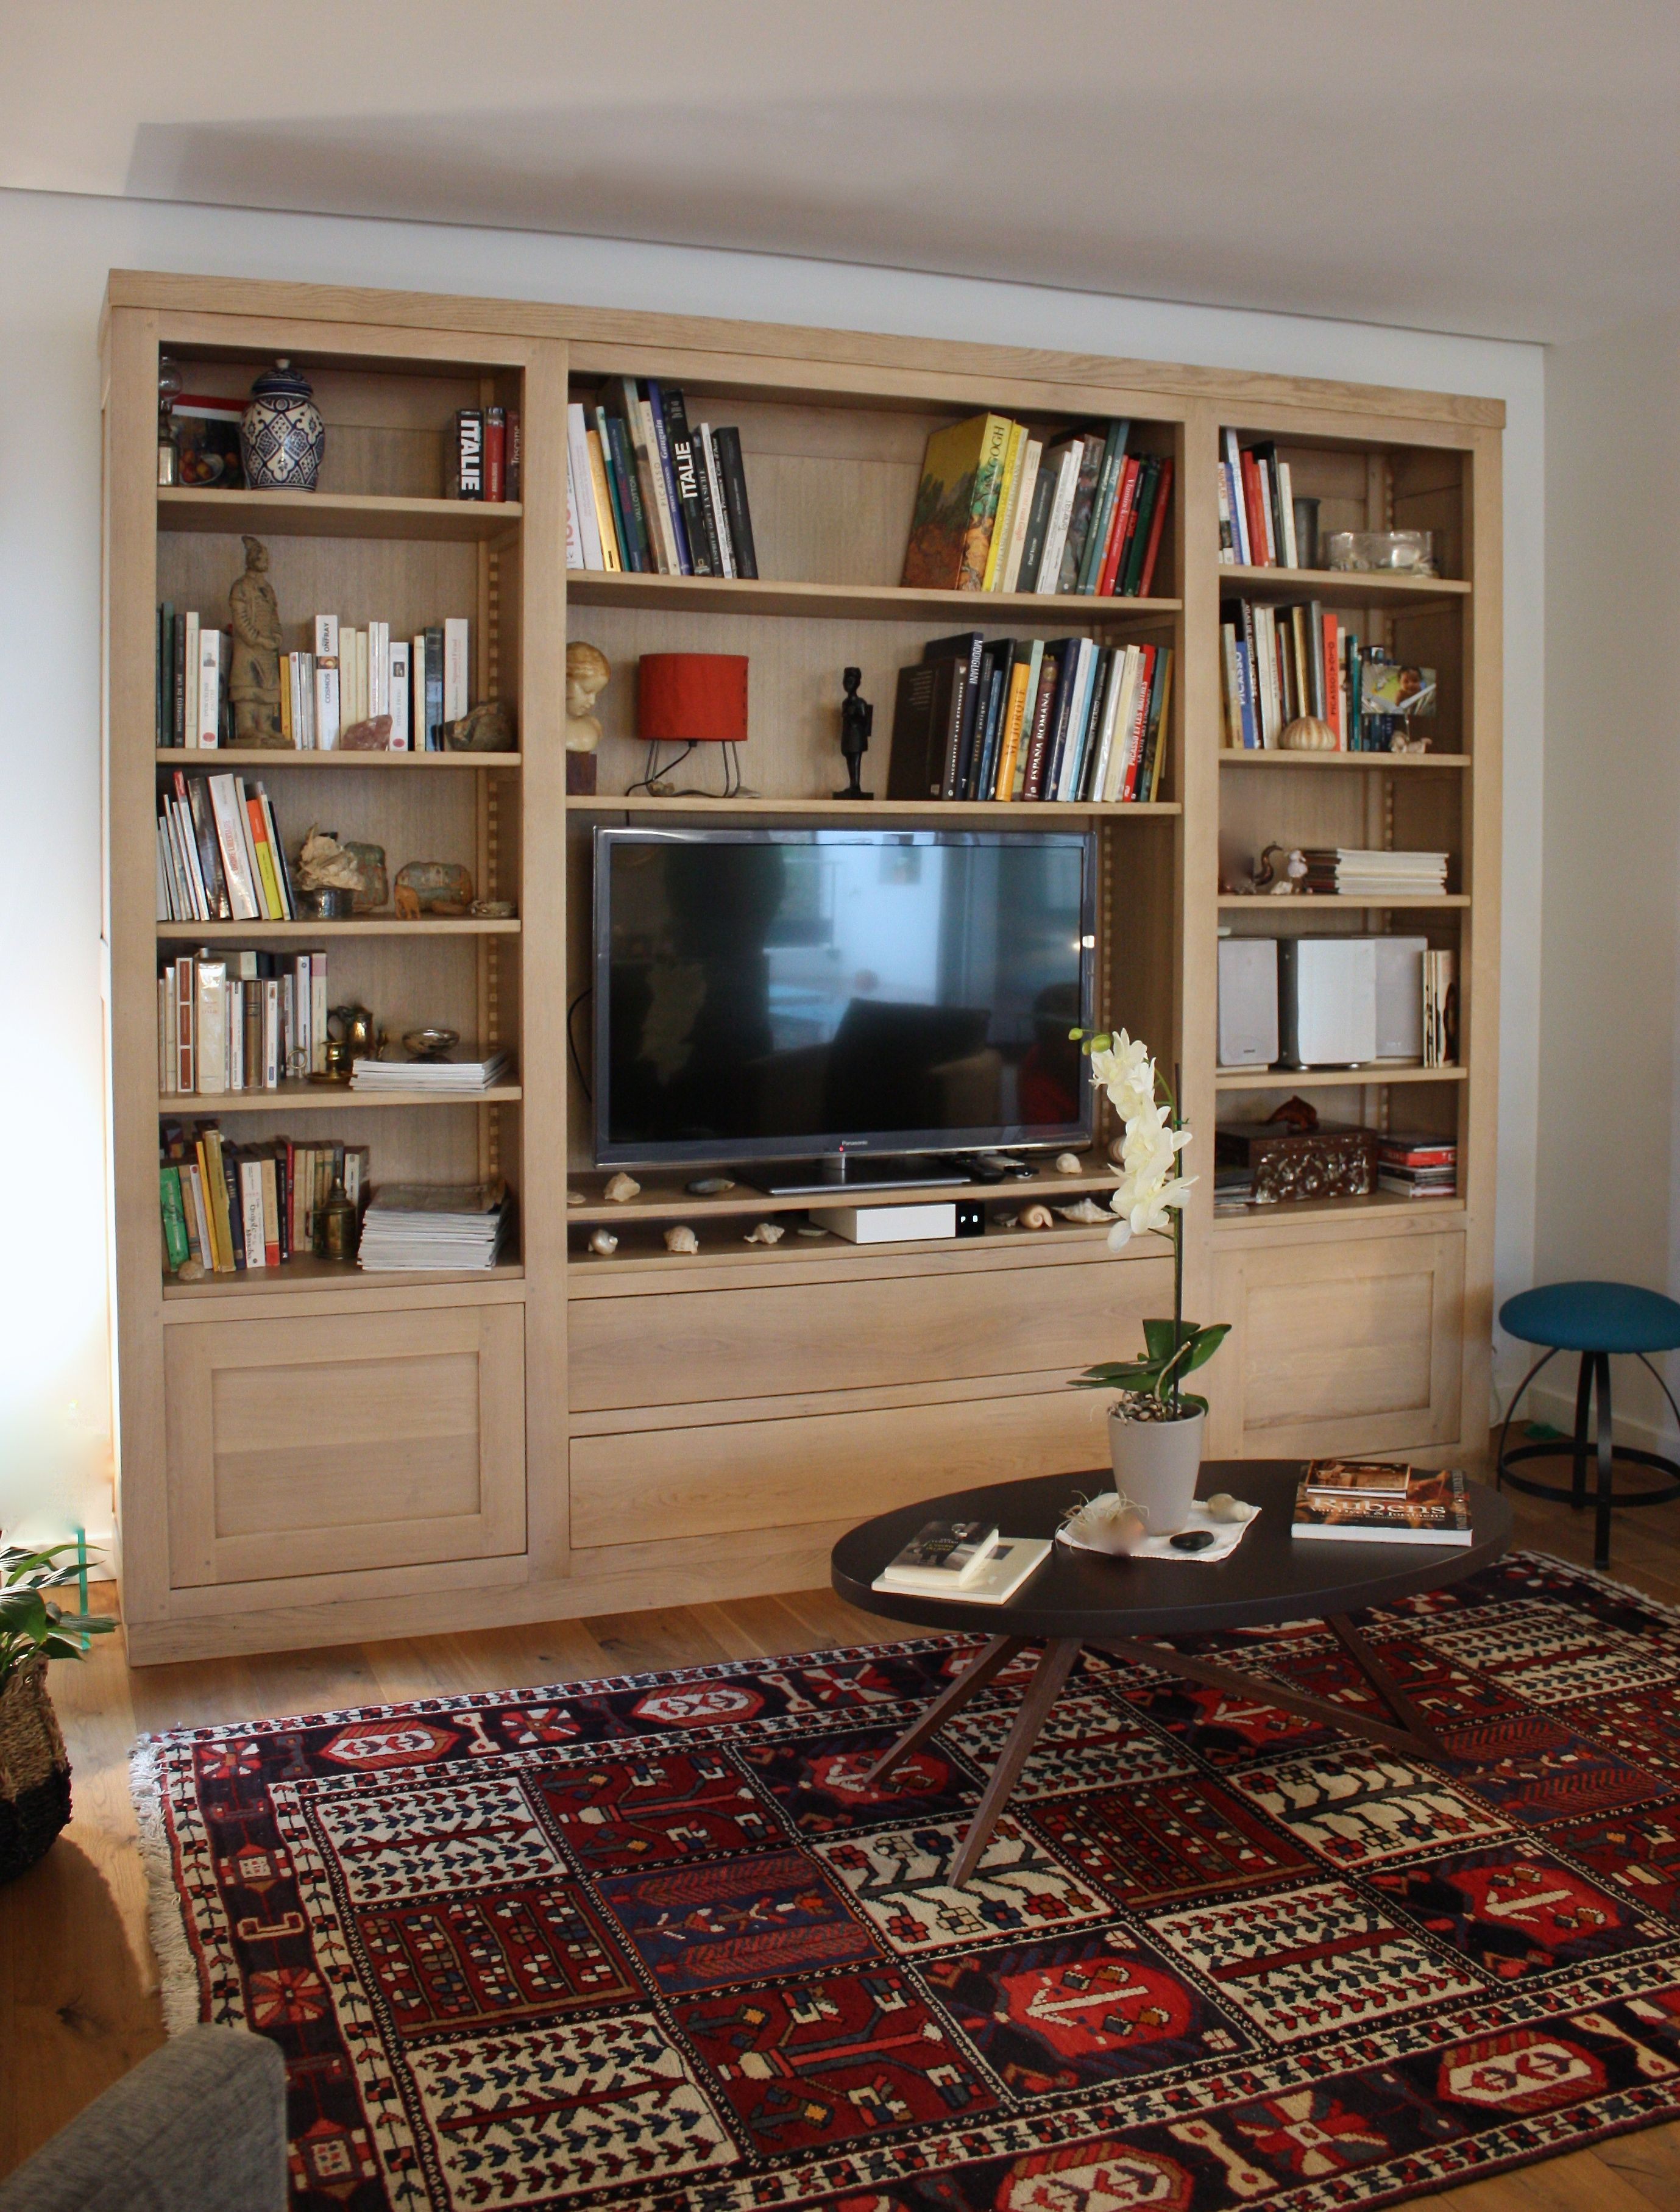 Bibliotheque Meuble Tv Chene Massif Meuble En Chene Massif Meuble Tv Chene Massif Meuble Chene